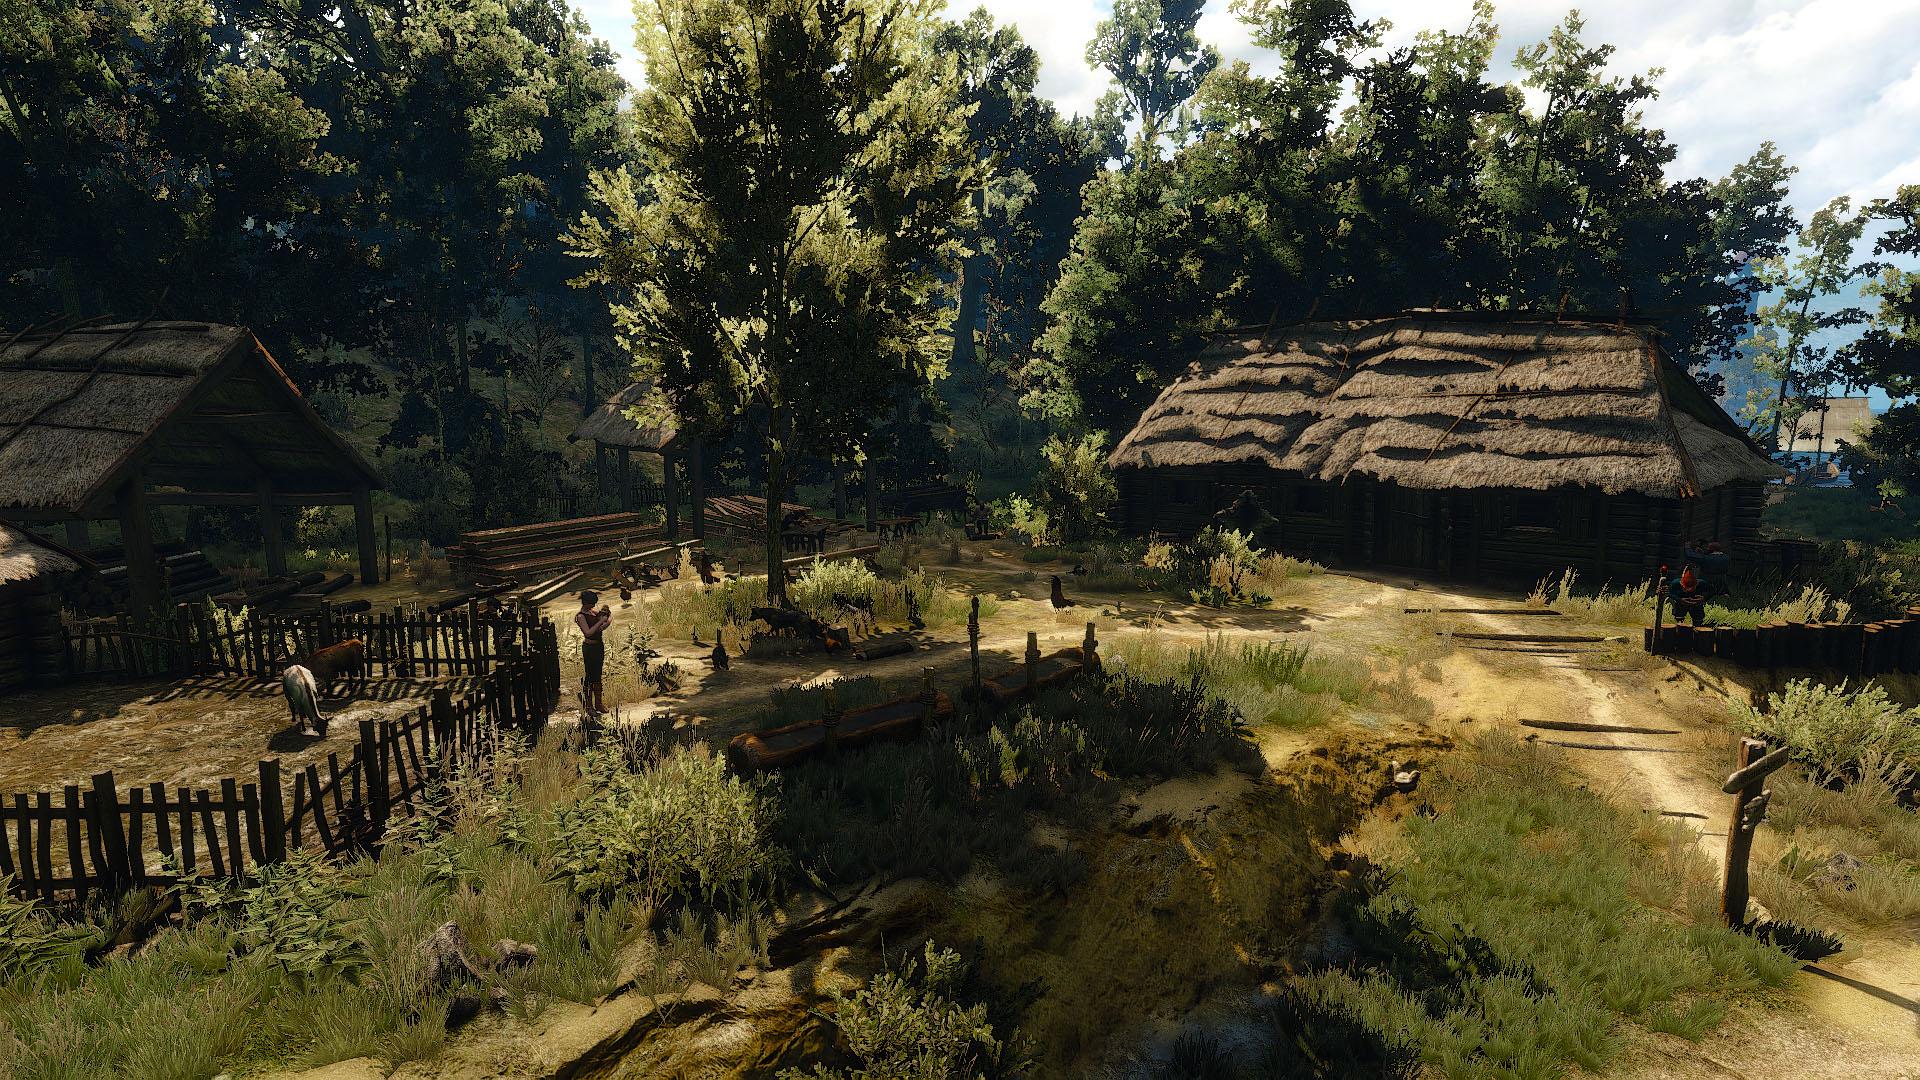 Loggers' Hut